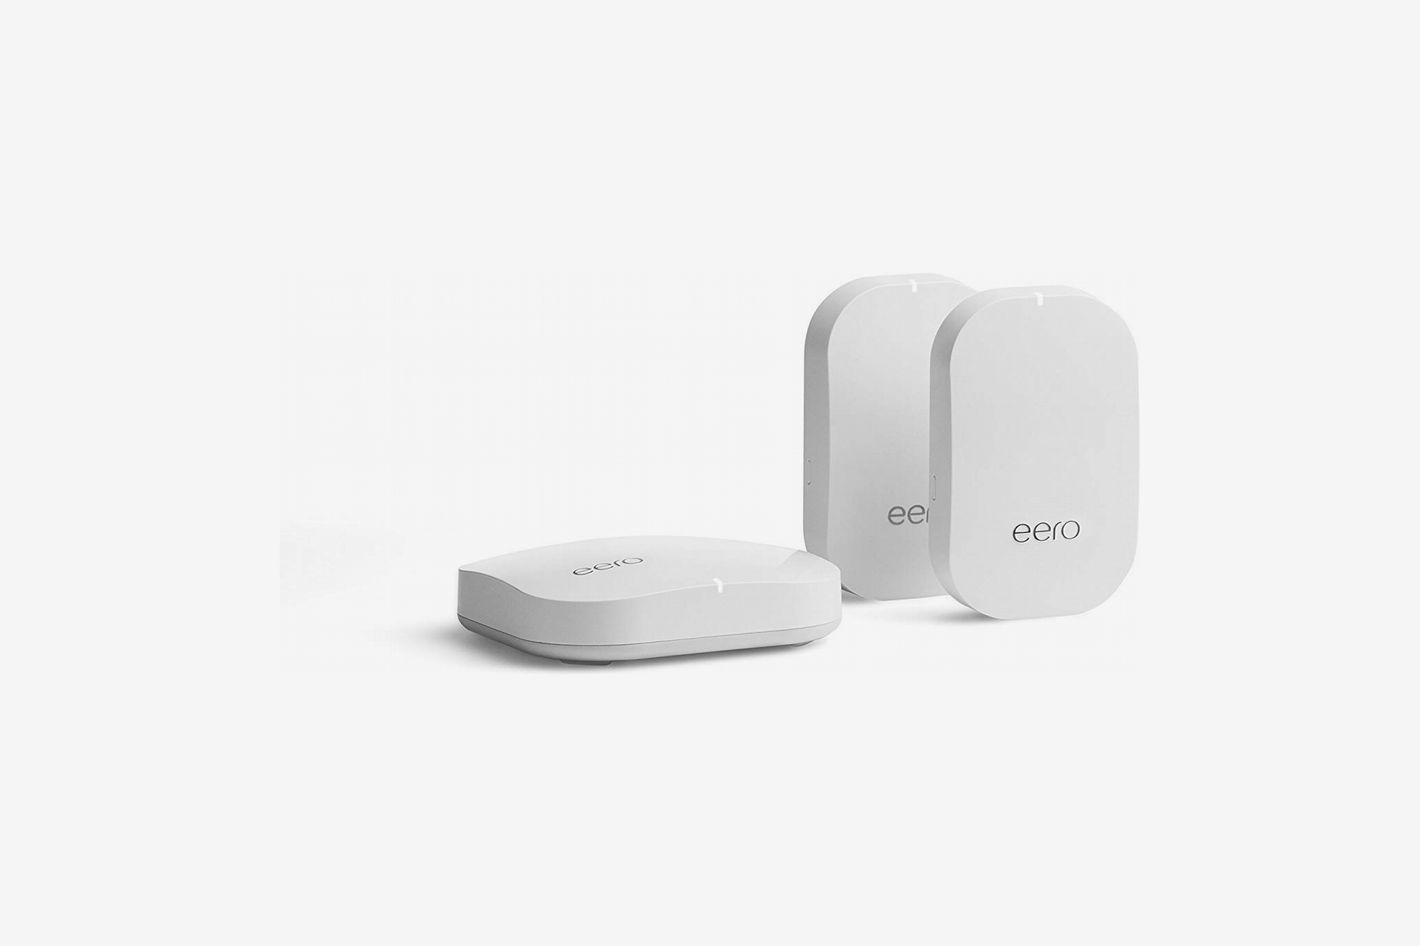 Eero Home Wi-Fi System (1 Eero + 2 Eero Beacon)